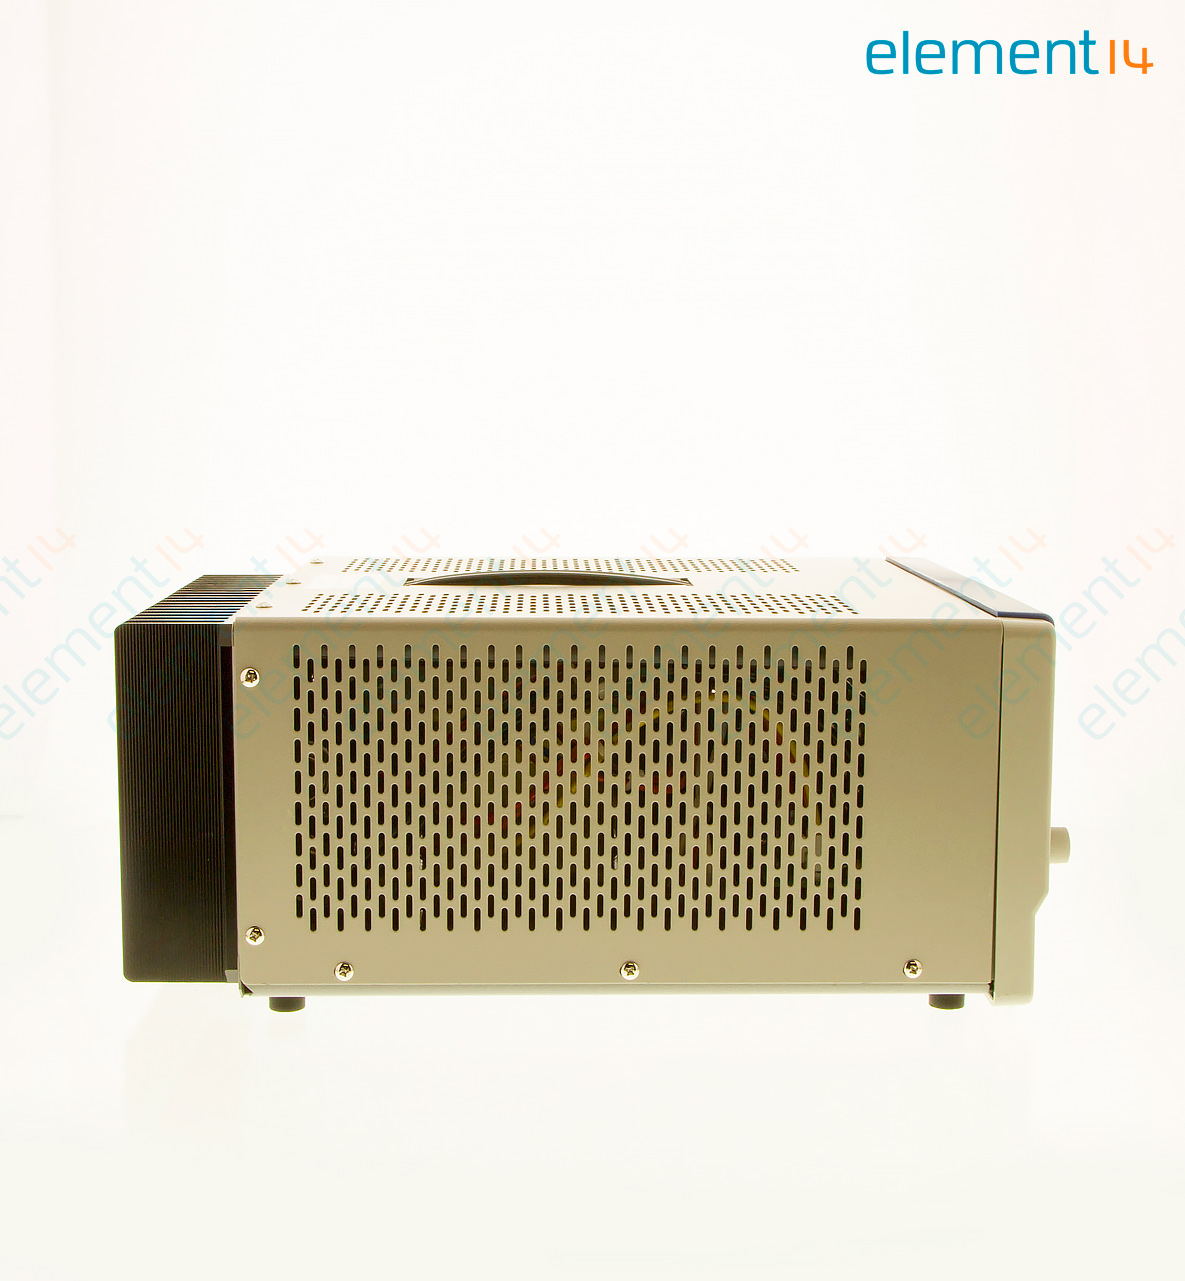 Bk1745a B K Precision Bench Power Supply Adjustable 1 Output 0 V 35 V 0 A 10 A